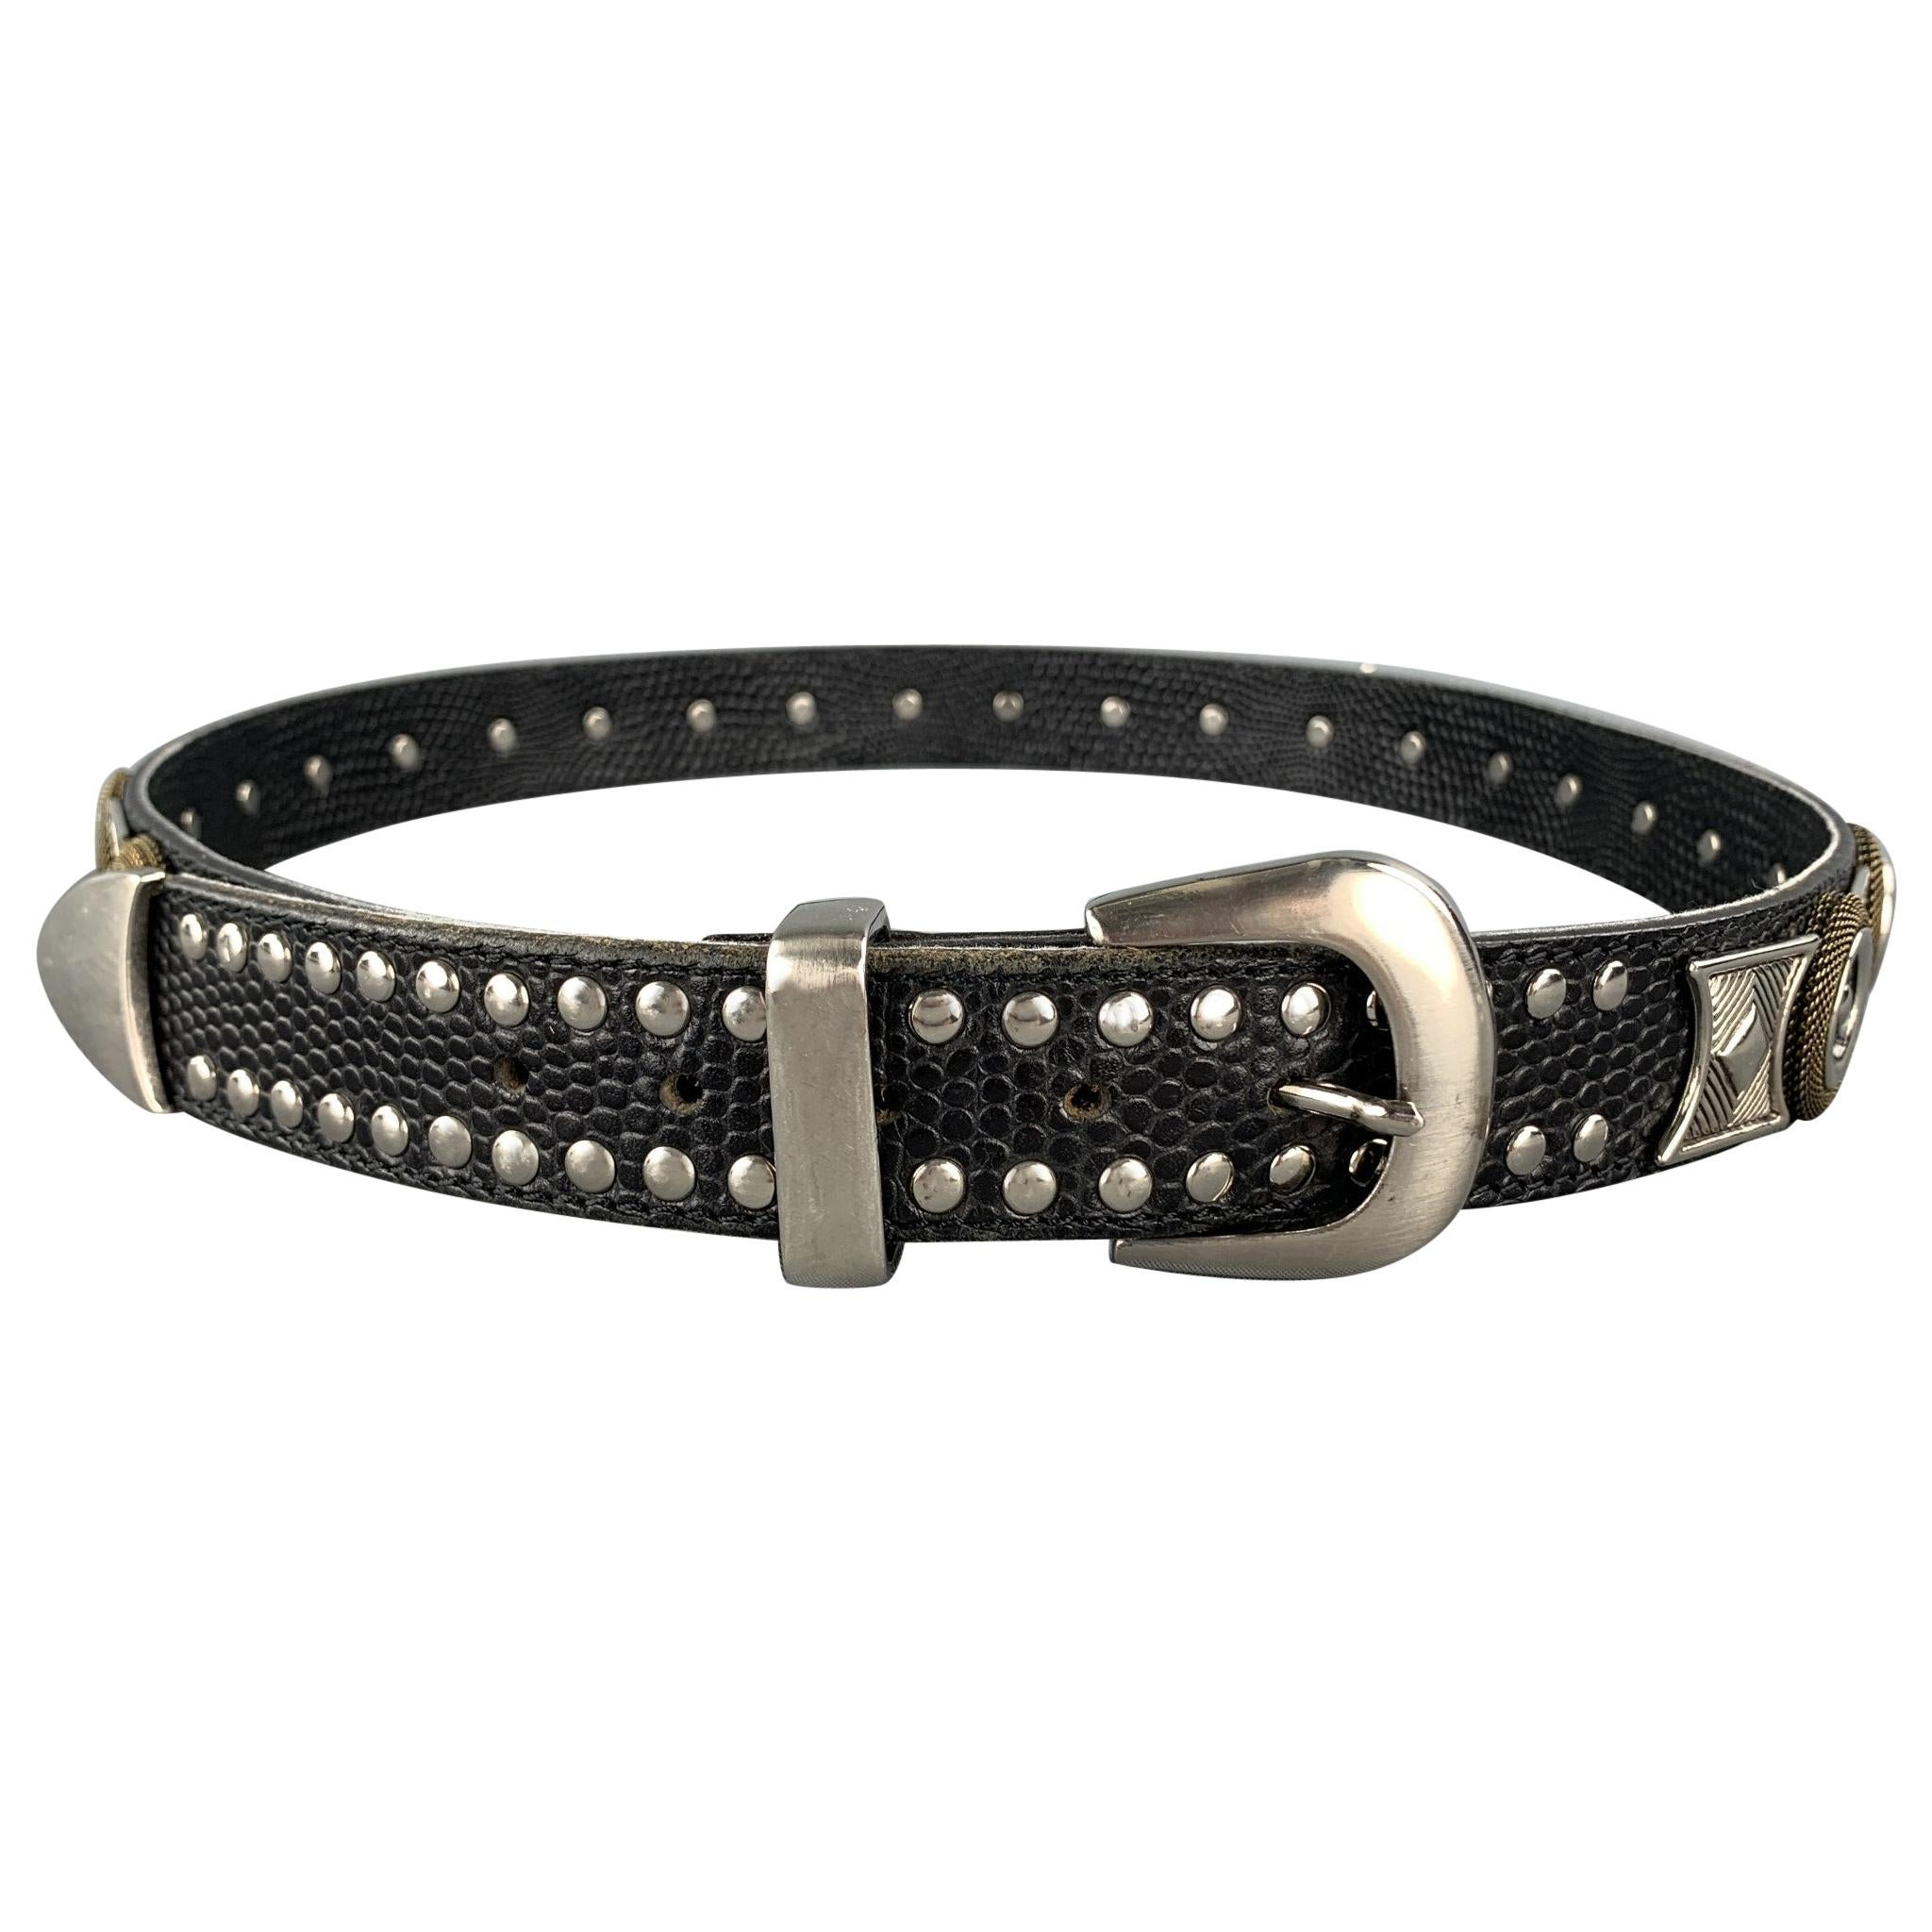 NANNI Size 36 Black & Silver Studded Leather Metal Belt